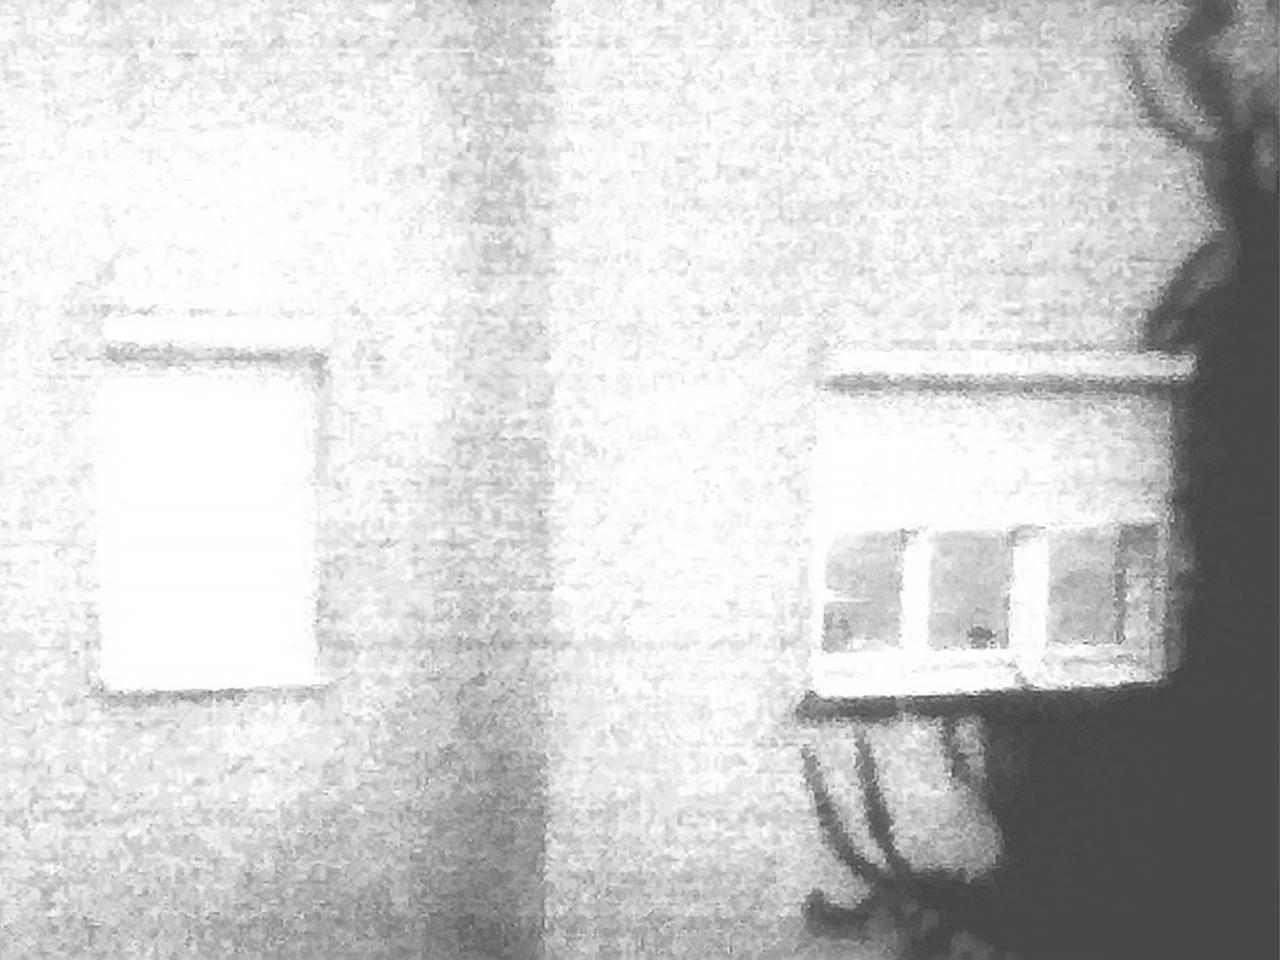 Rédling Hanna: ólom lom (2015)